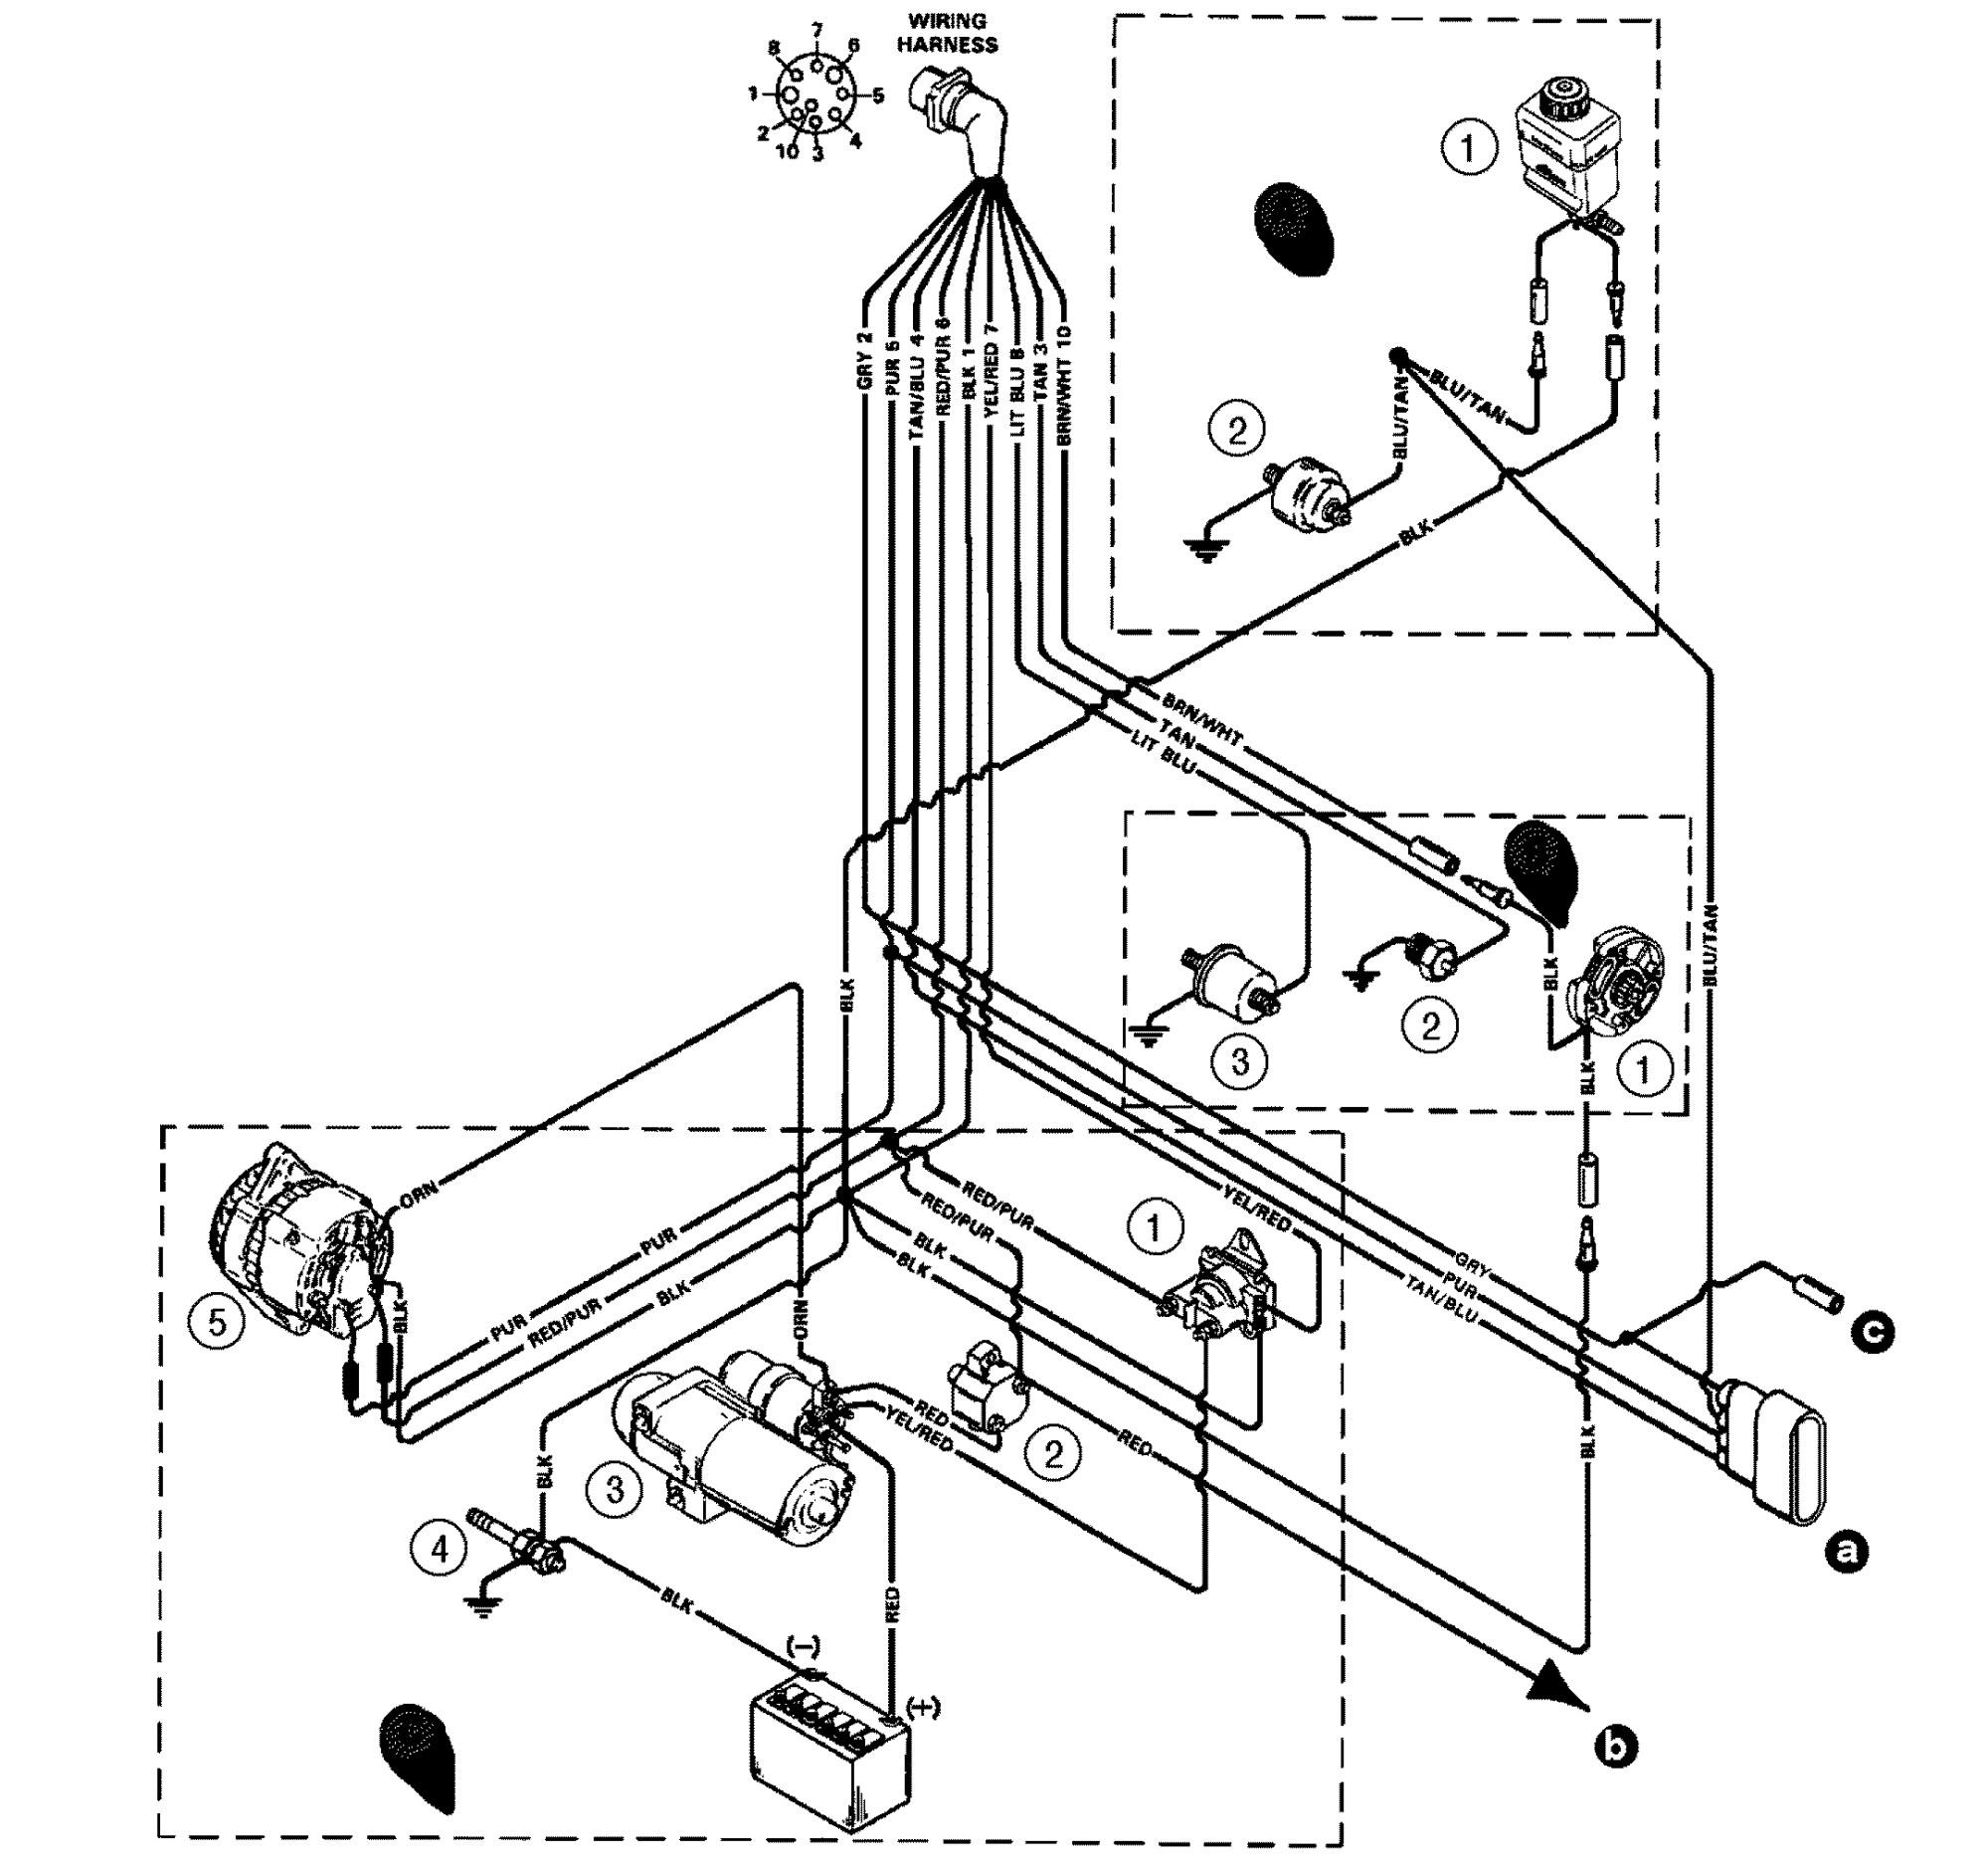 hight resolution of 5 7 mercruiser wiring diagram wiring diagram g8 mercruiser 350 alternator wiring diagram mercruiser 350 wiring diagram